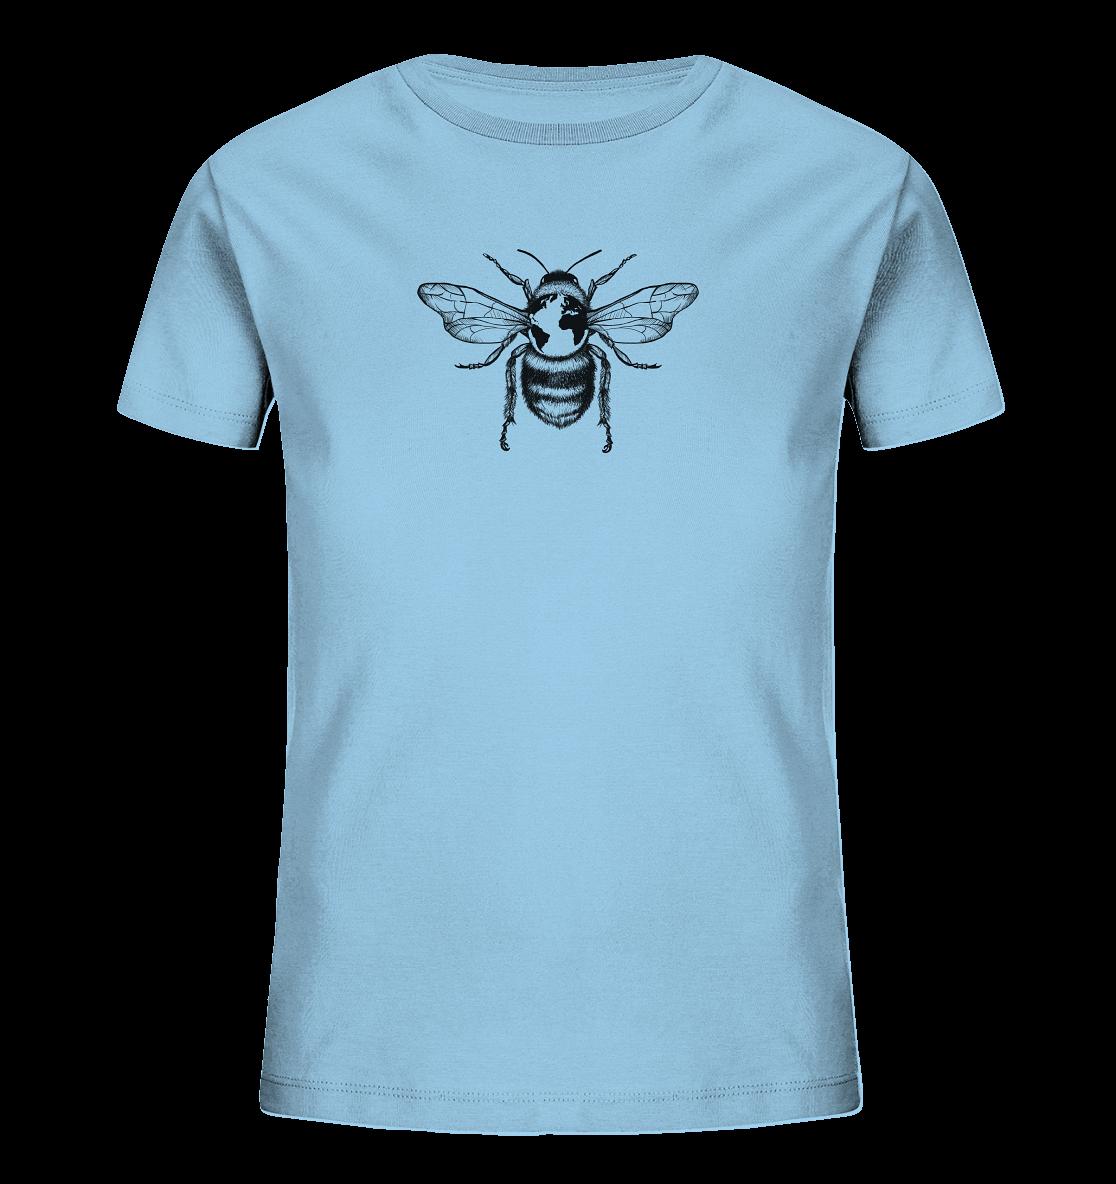 front-kids-organic-shirt-9fd0ed-1116x-2.png